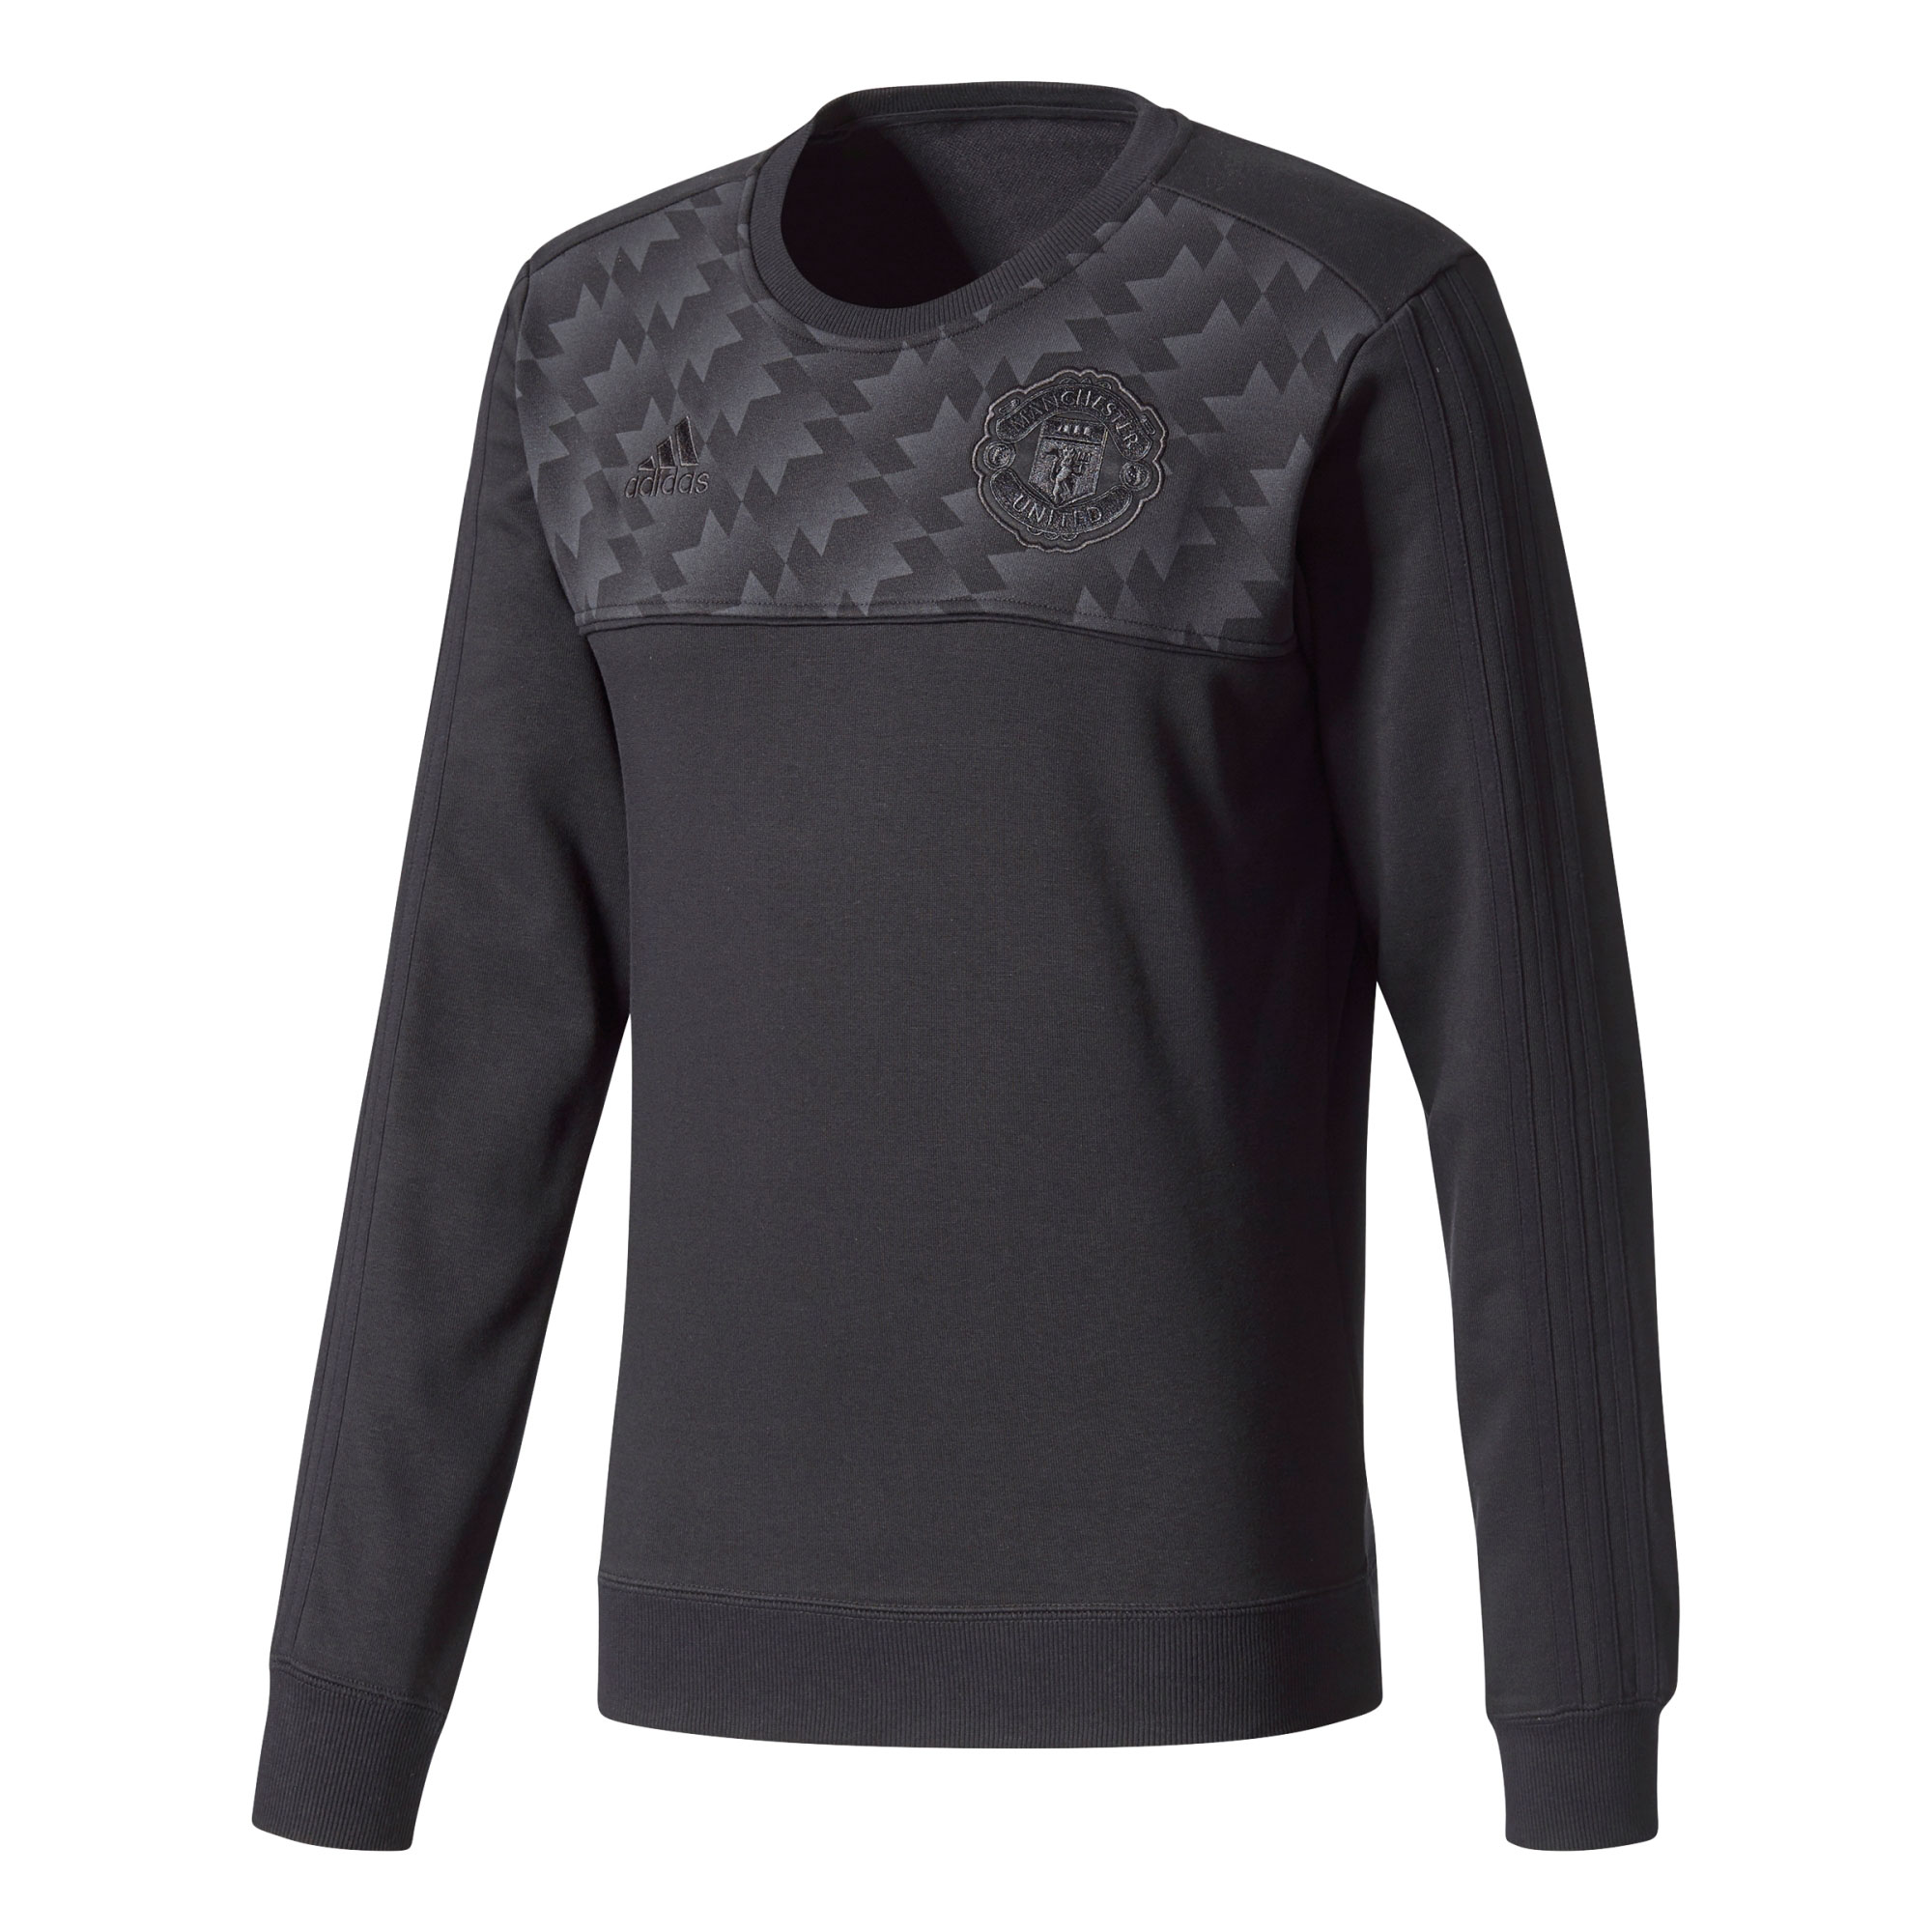 Manchester United Sweatshirt - Black